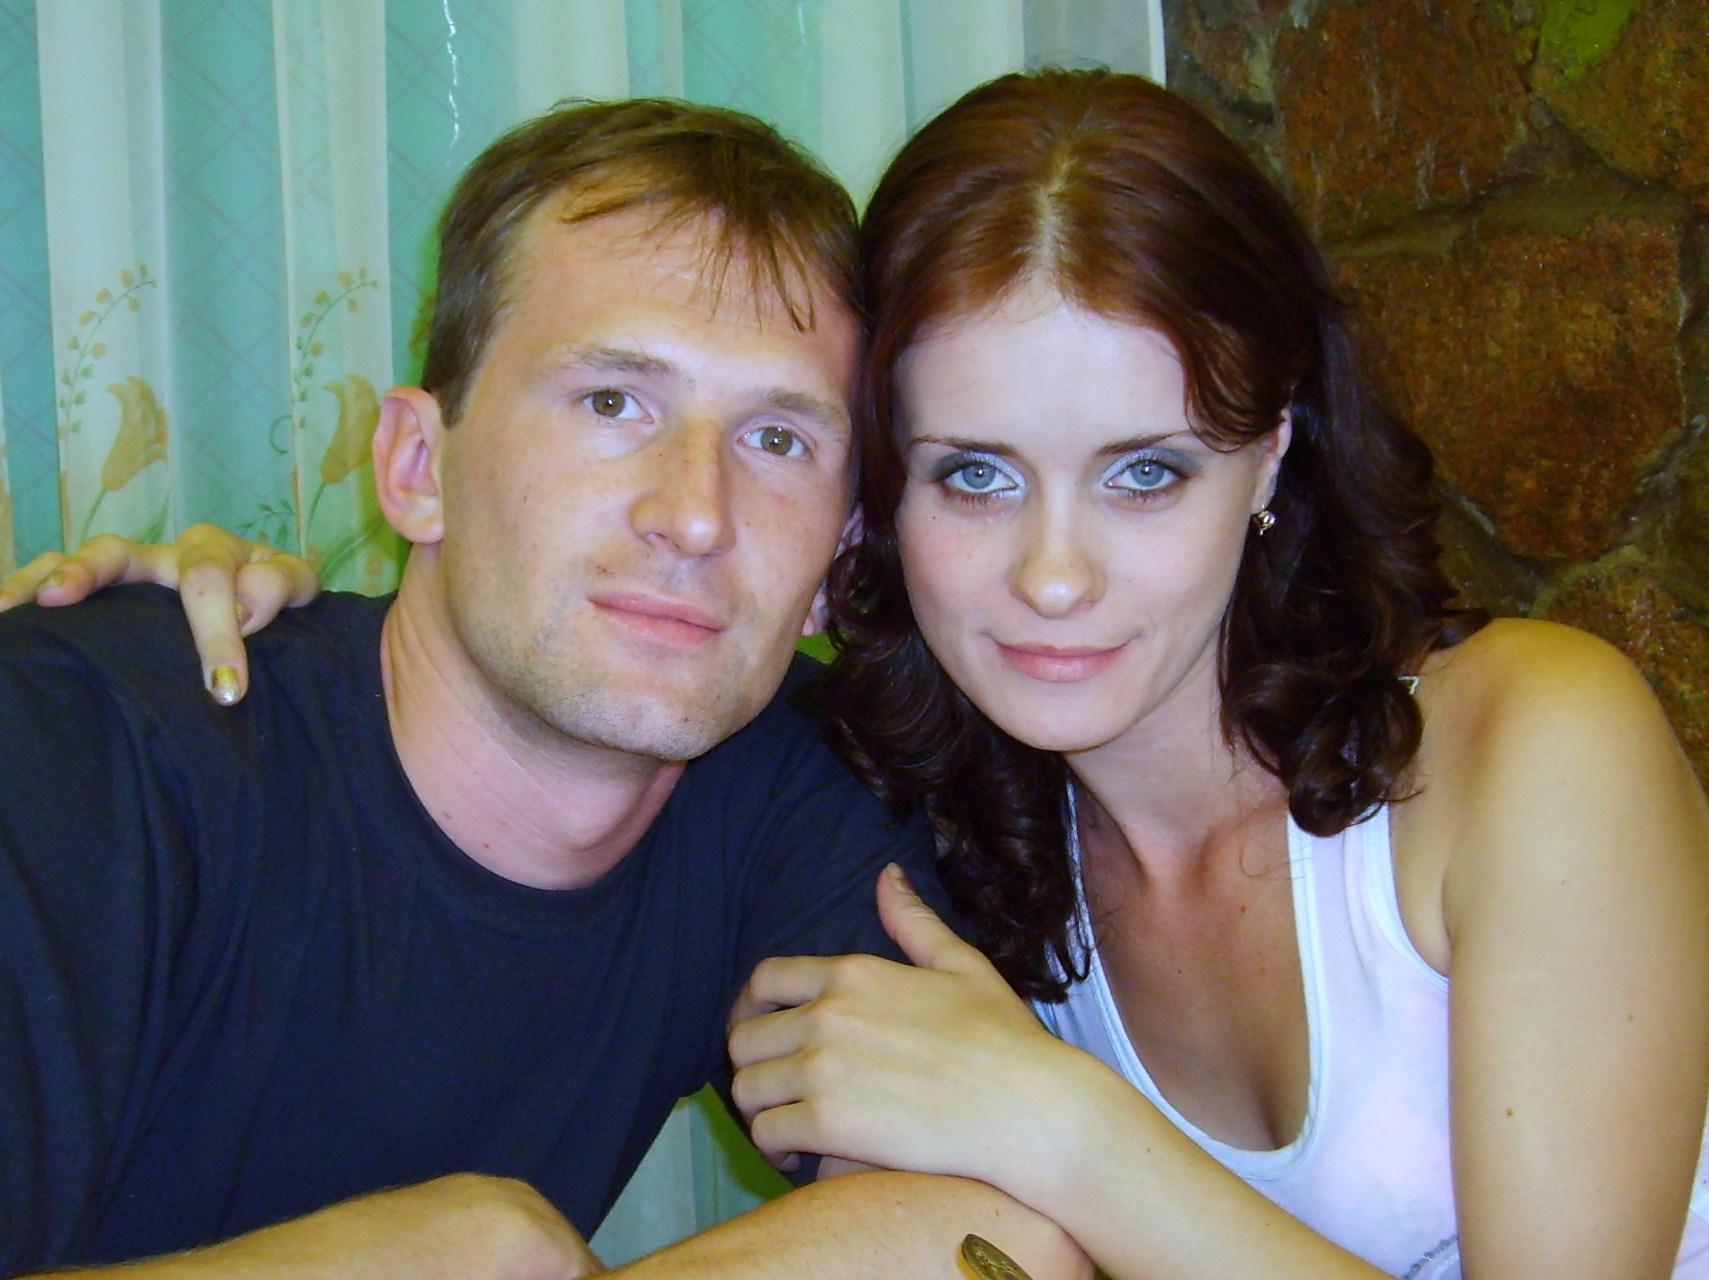 Белых трусов я и моя жена фото астрахани